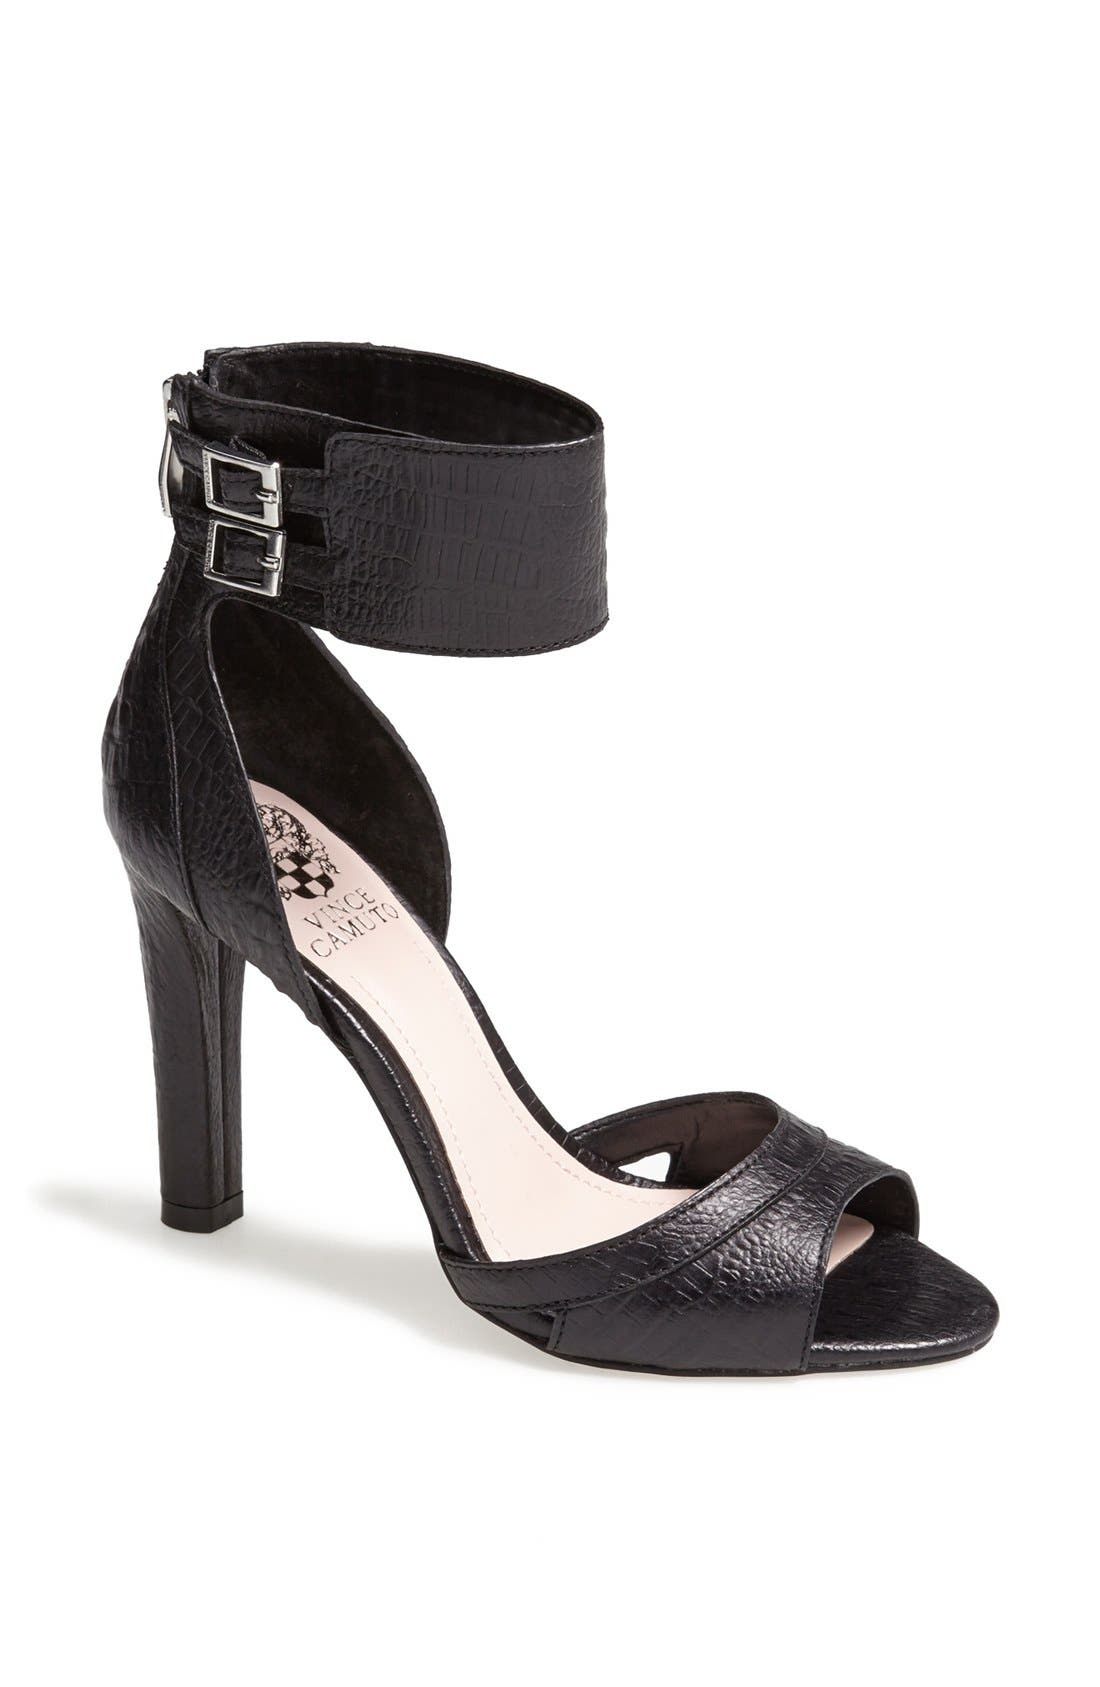 Main Image - Vince Camuto 'Oljera' Leather Sandal